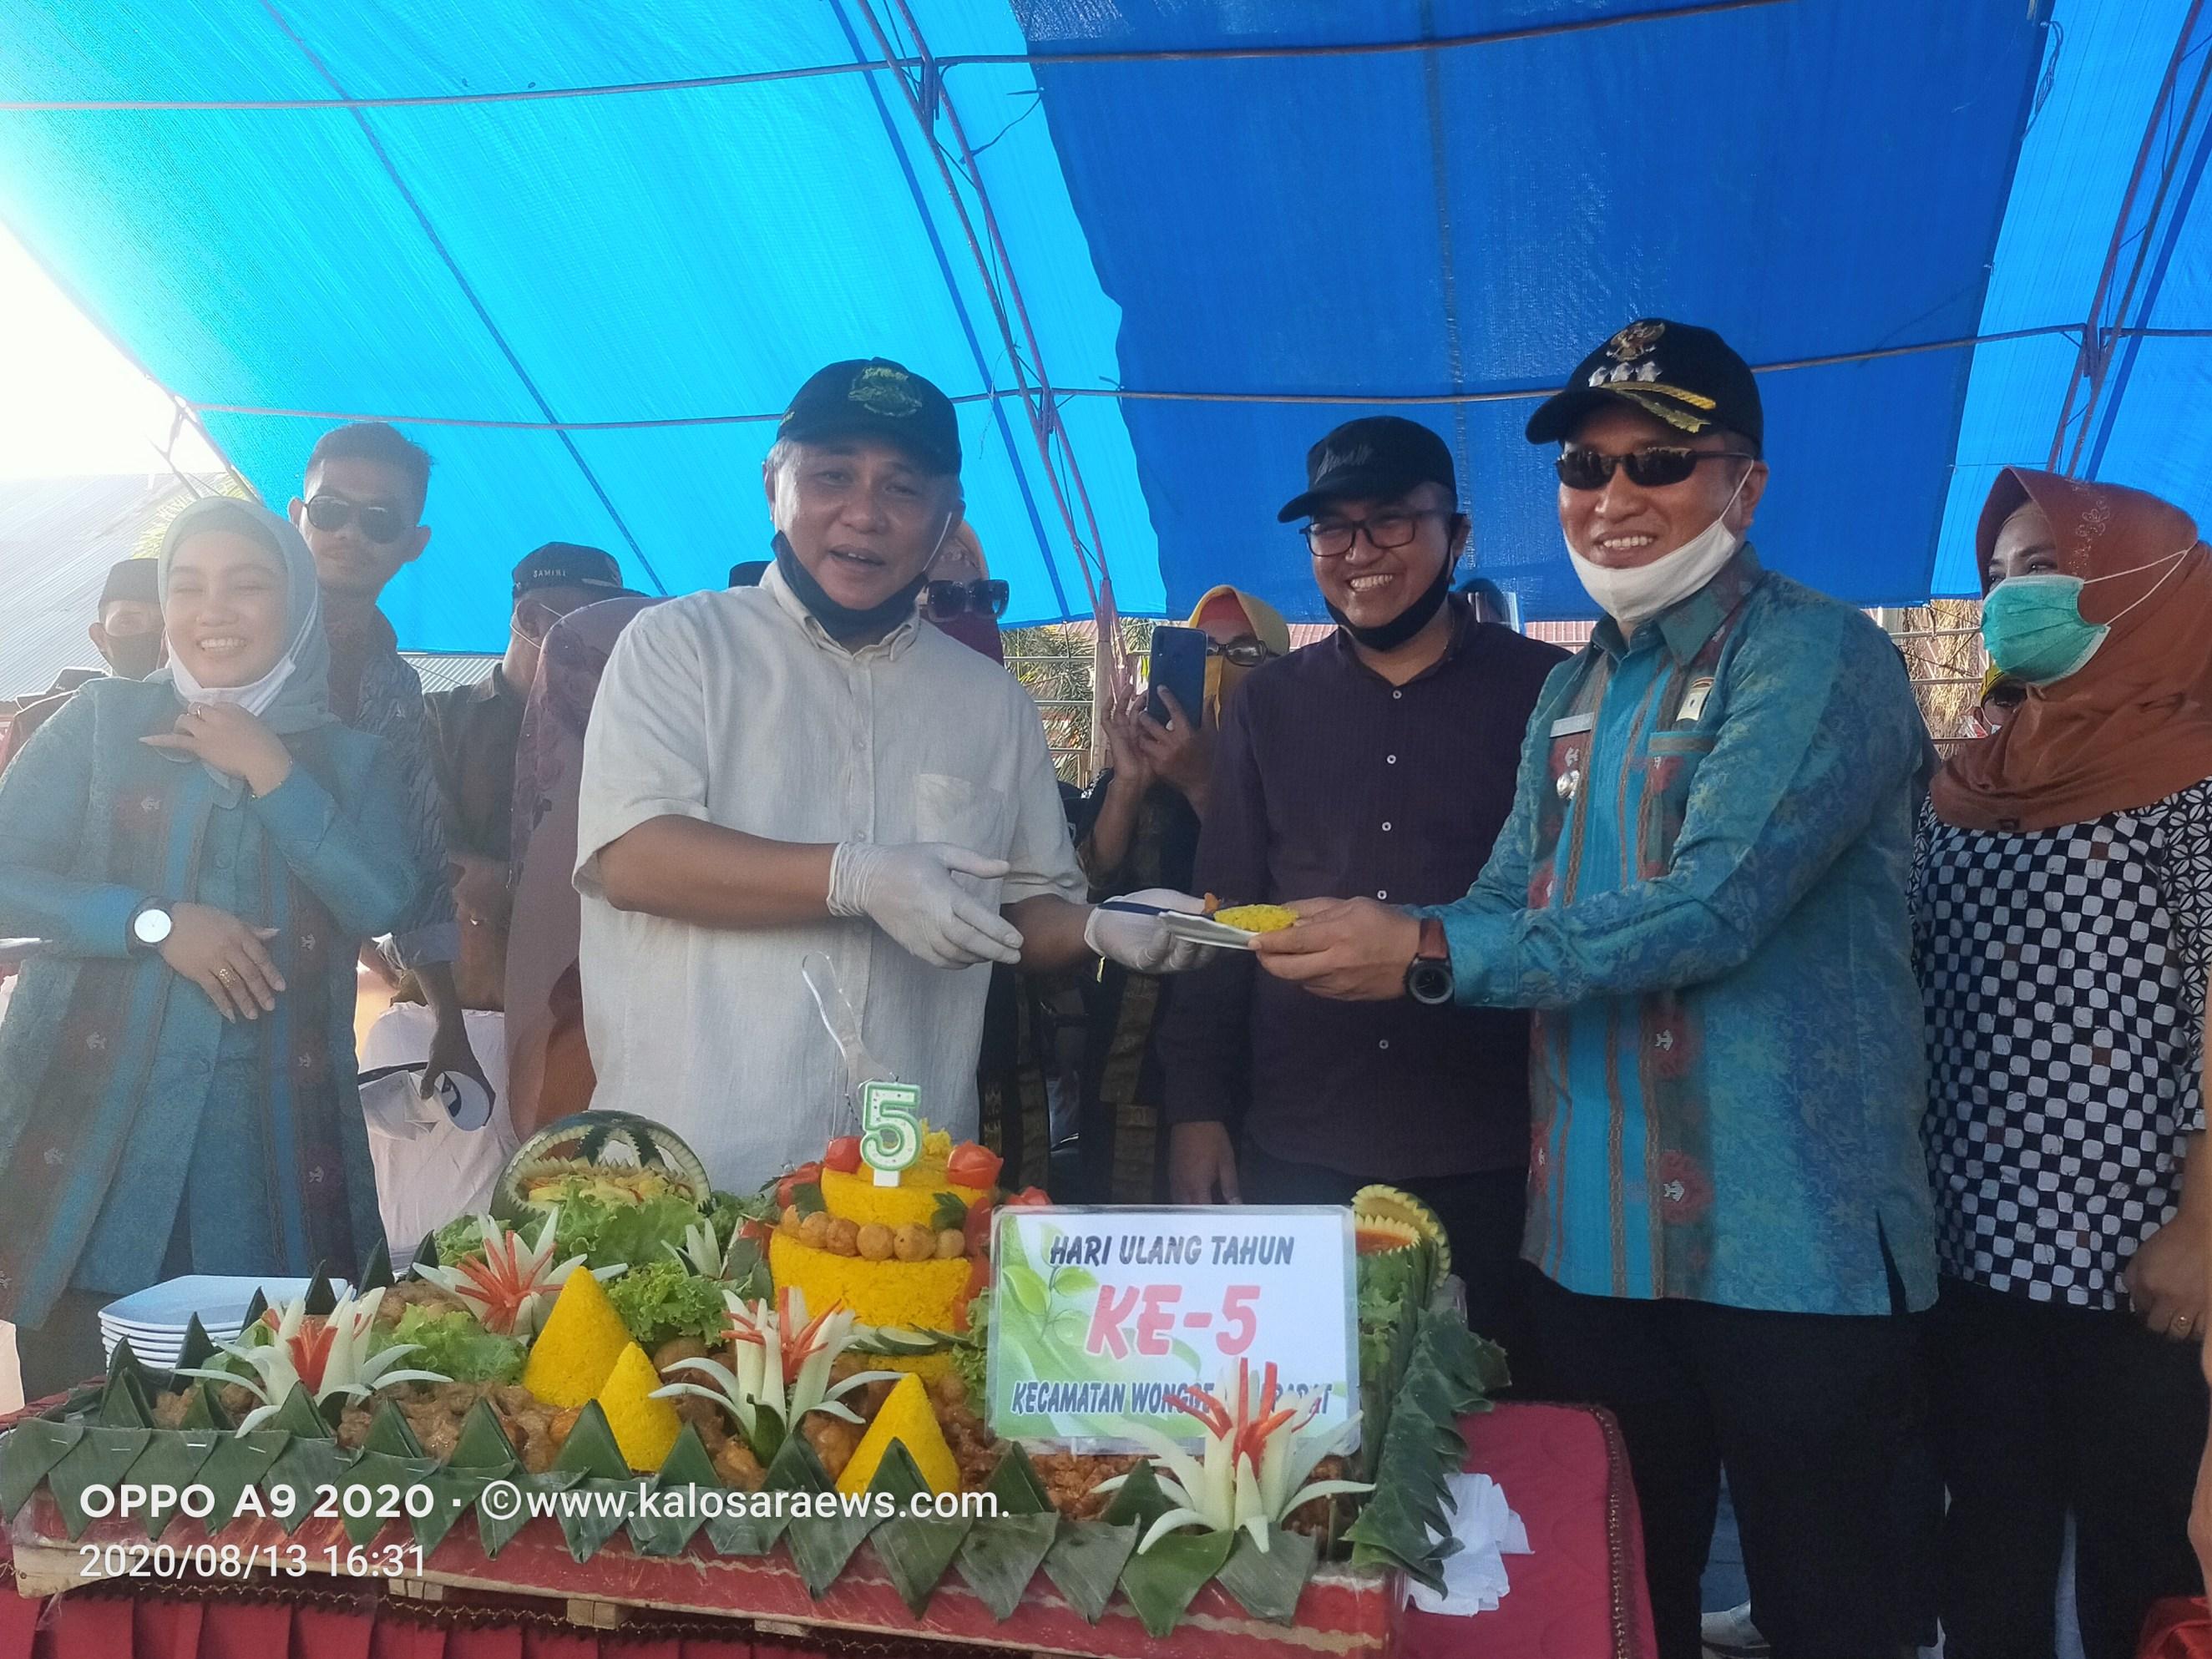 Ketgam : Bupati Konawe Kery Saiful Konggoasa (kiri), menyerahkan potongan nasi tumpeng kepada Camat Wonggeduku Barat Abdul Hasim (tengah). Tampak Ketua DPRD Konawe H Ardin (dua dari kiri) dan Sekab Konawe Ferdinand Sapan (kanan).